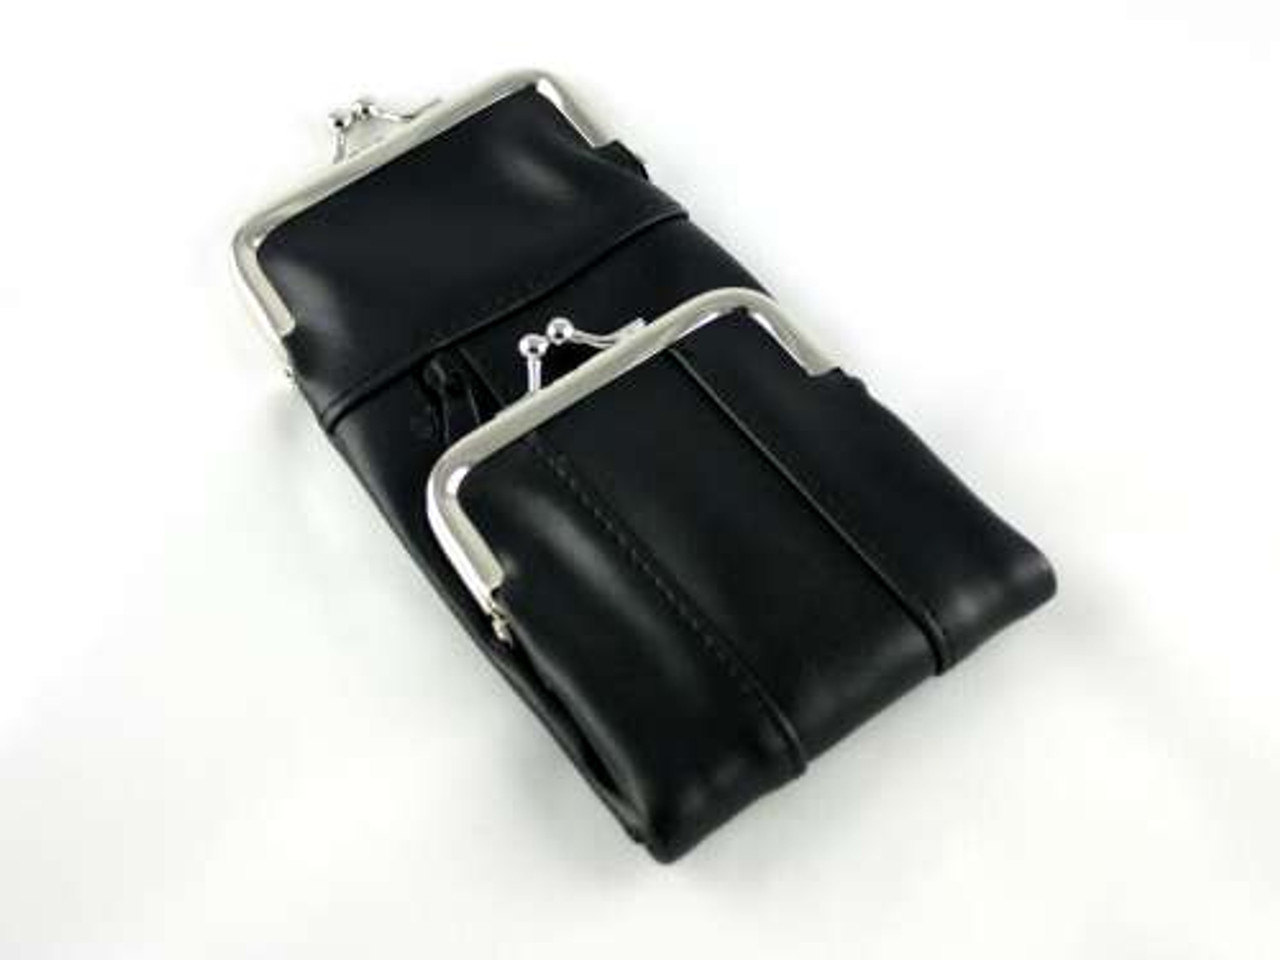 Black Leather Combo Cigarette Pack Holder